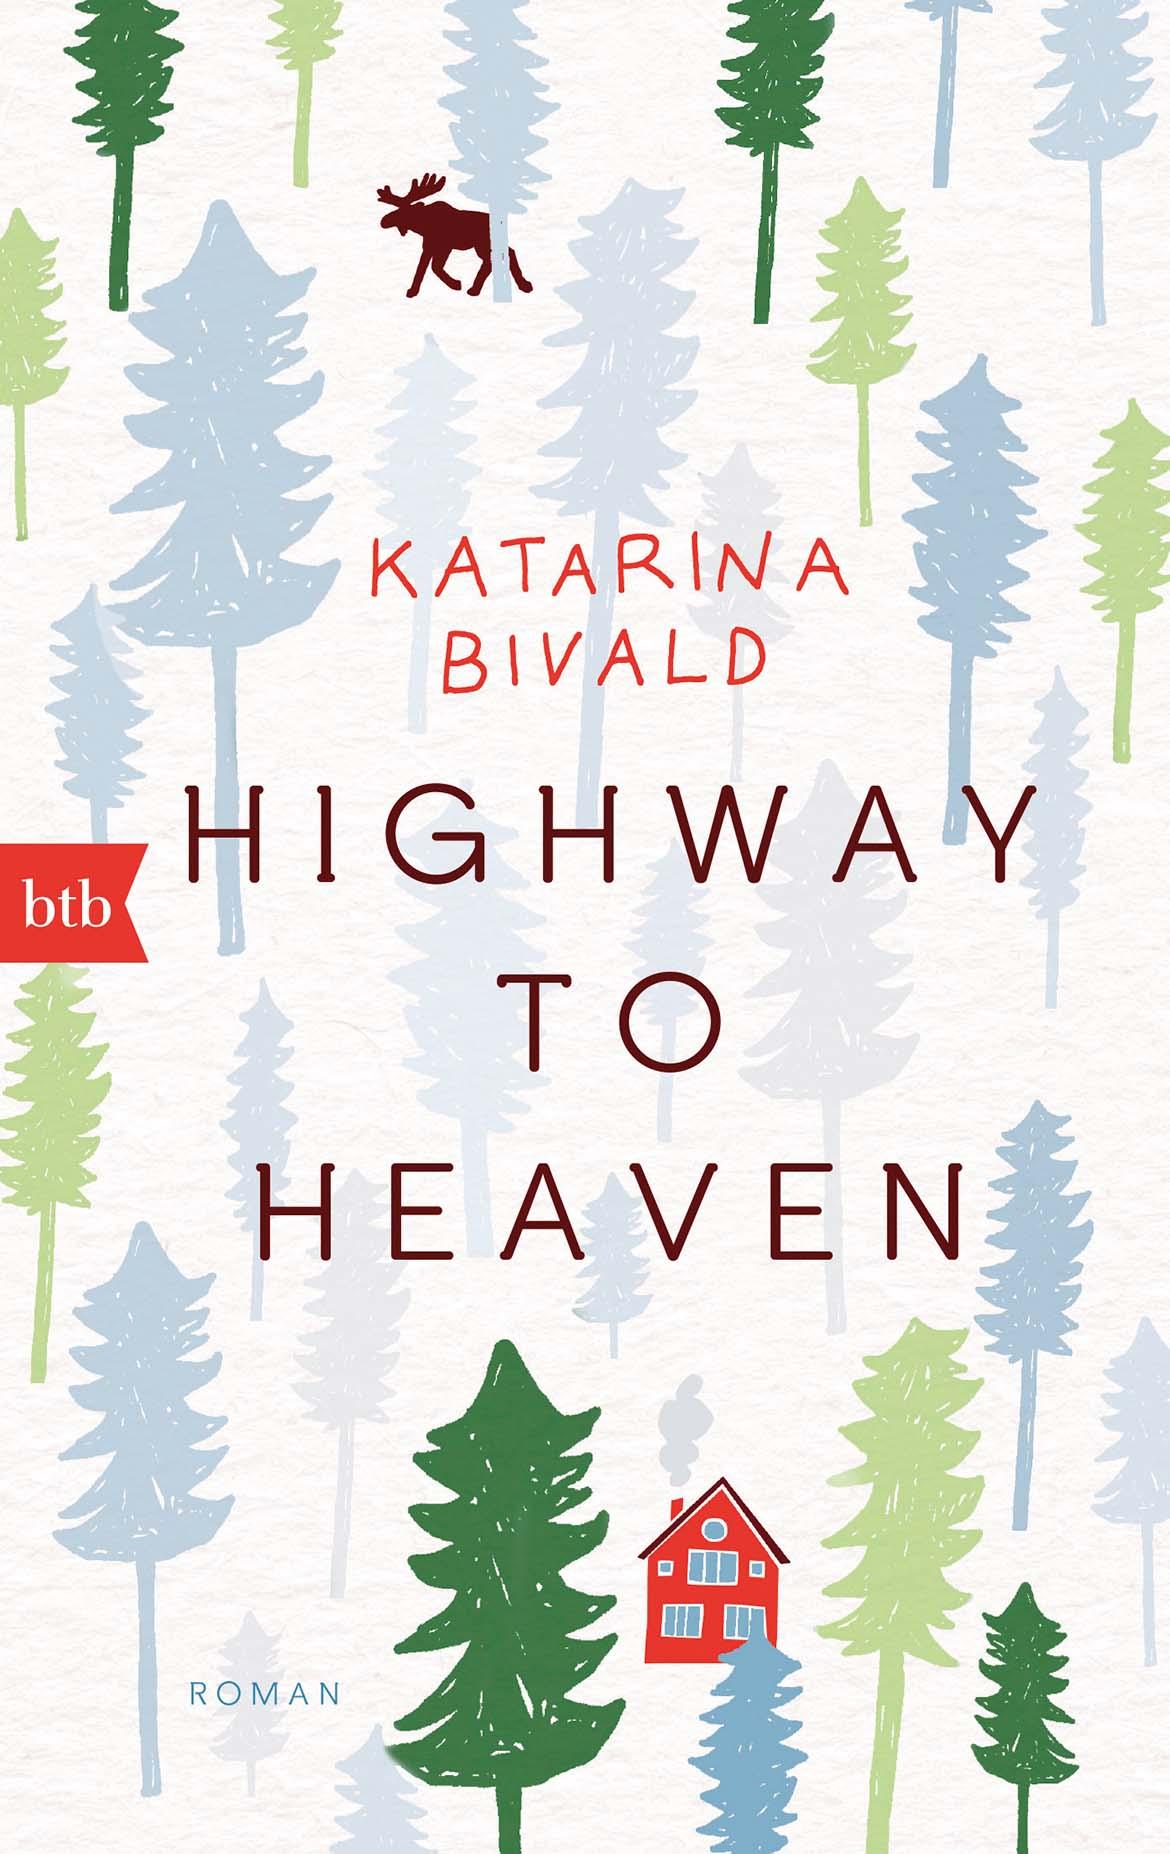 Katarina Bivald – Highway to heaven